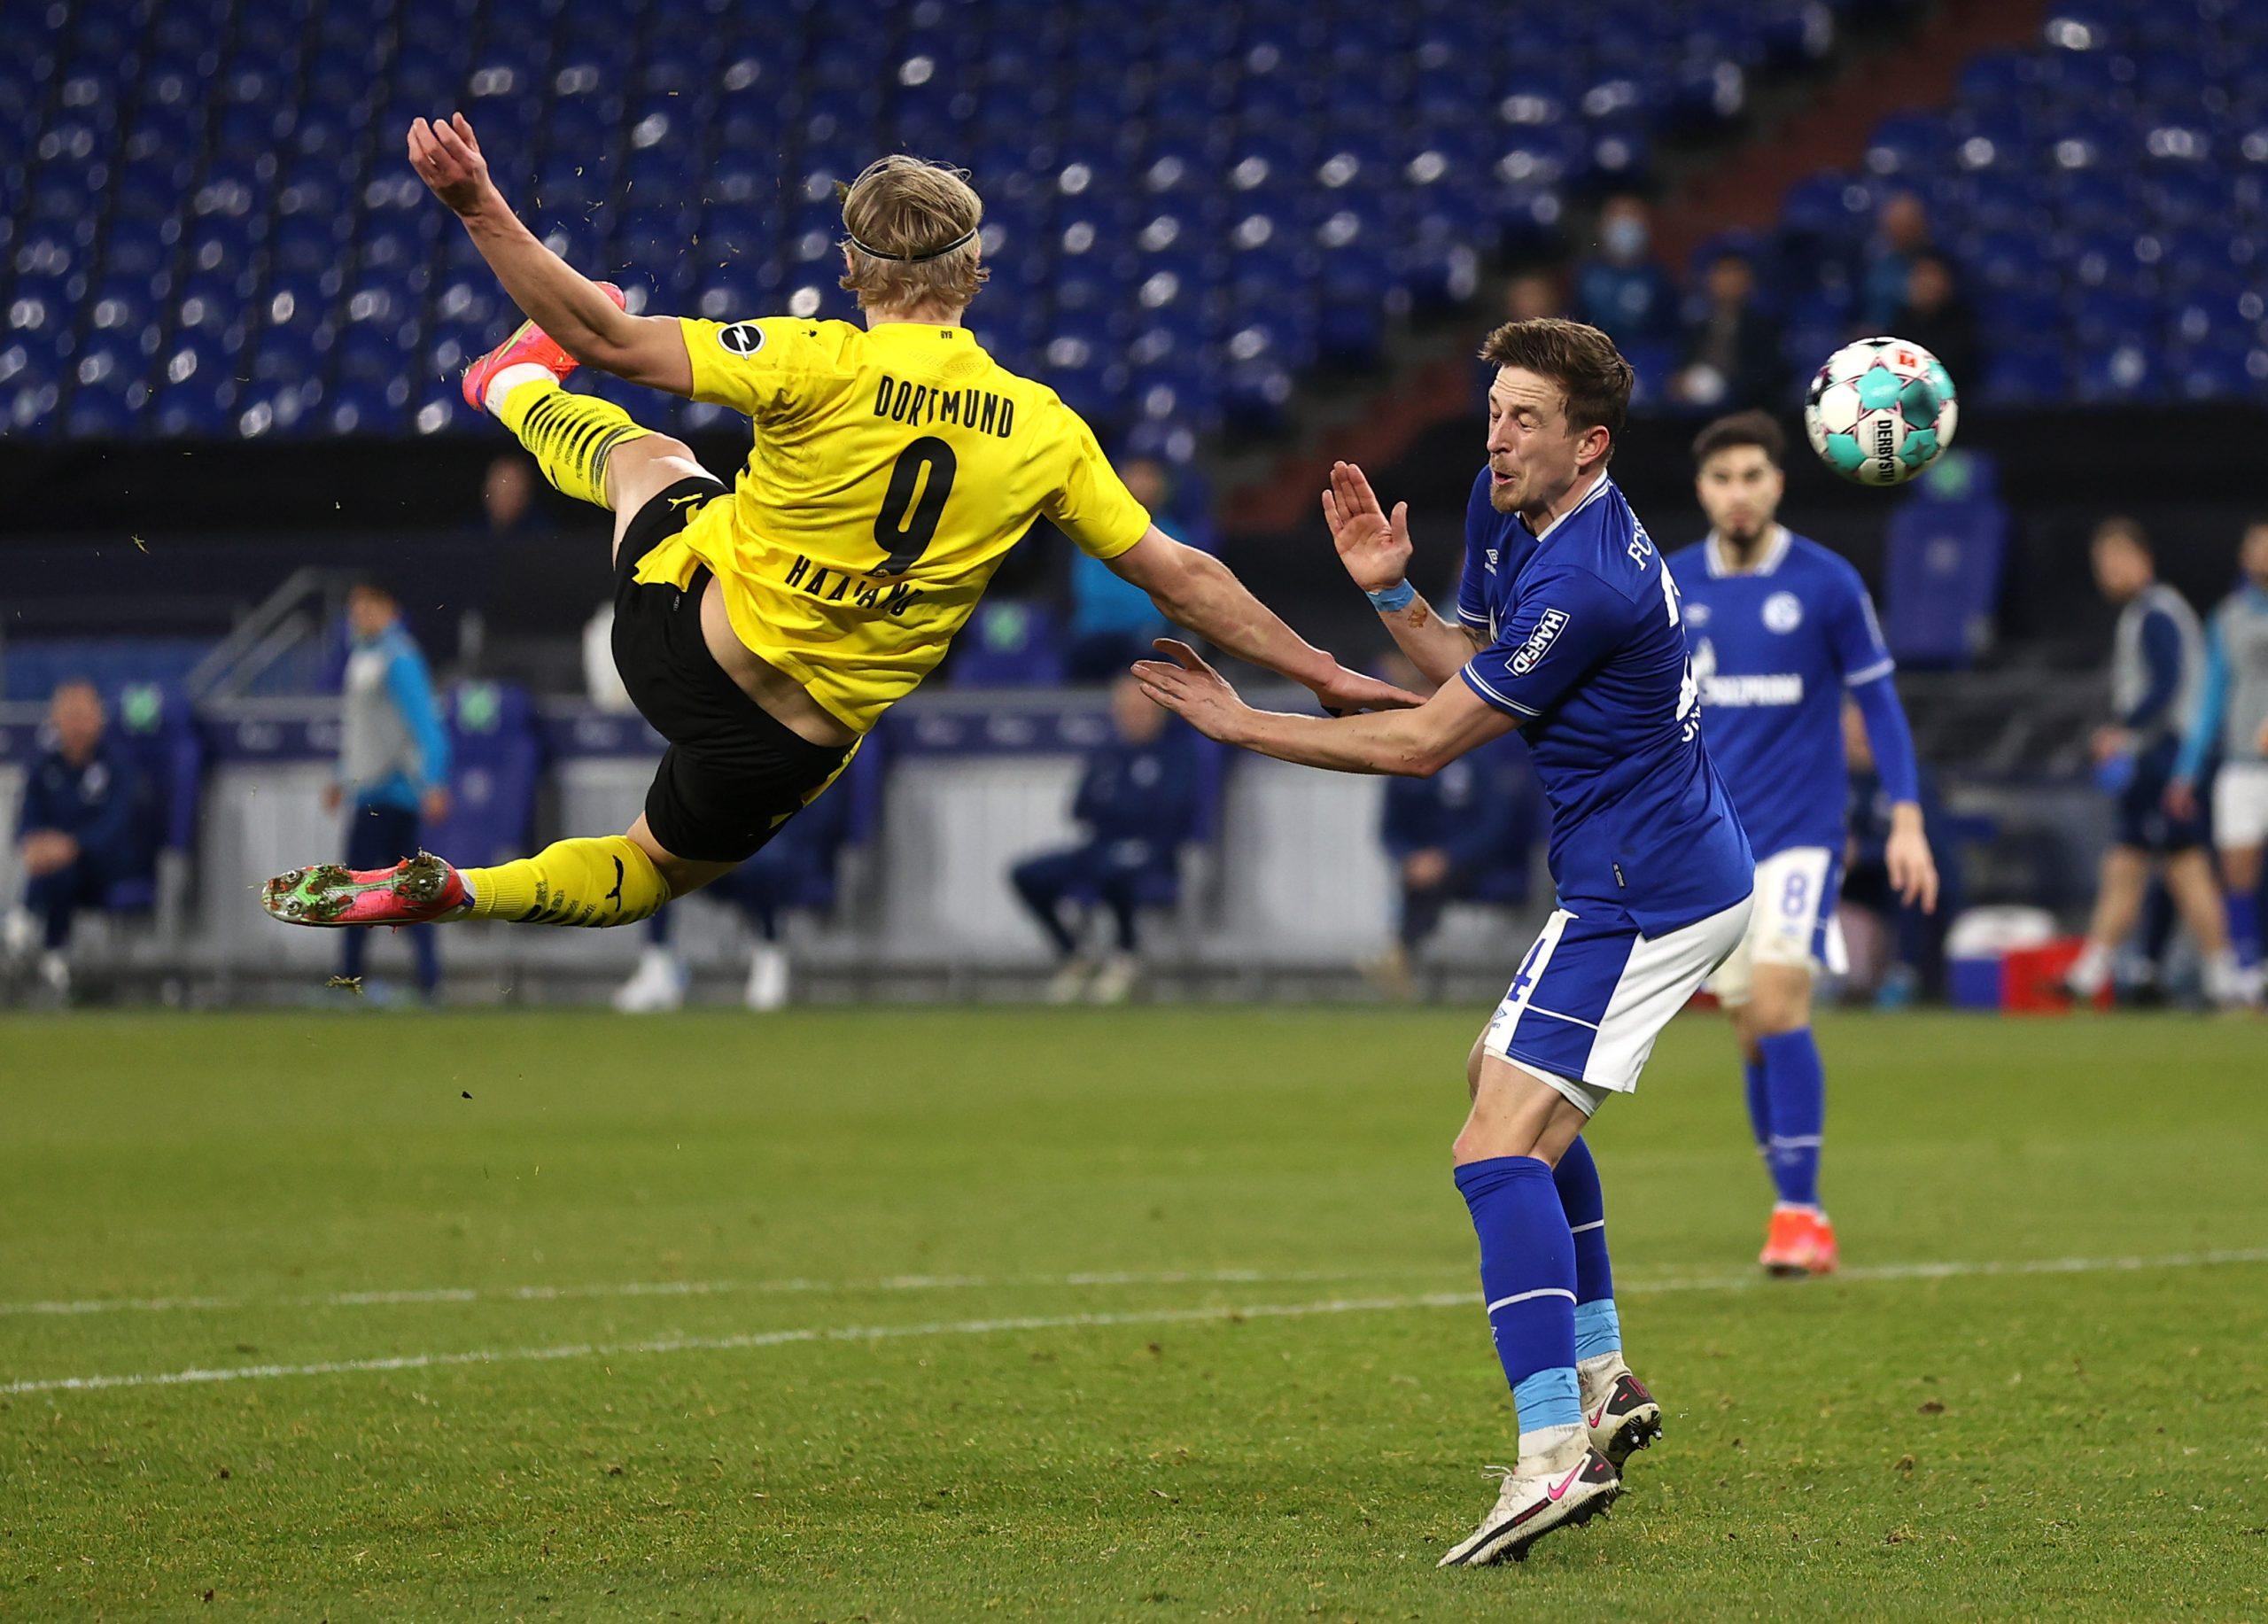 Erling Haaland - Schalke vs Borussia Dortmund